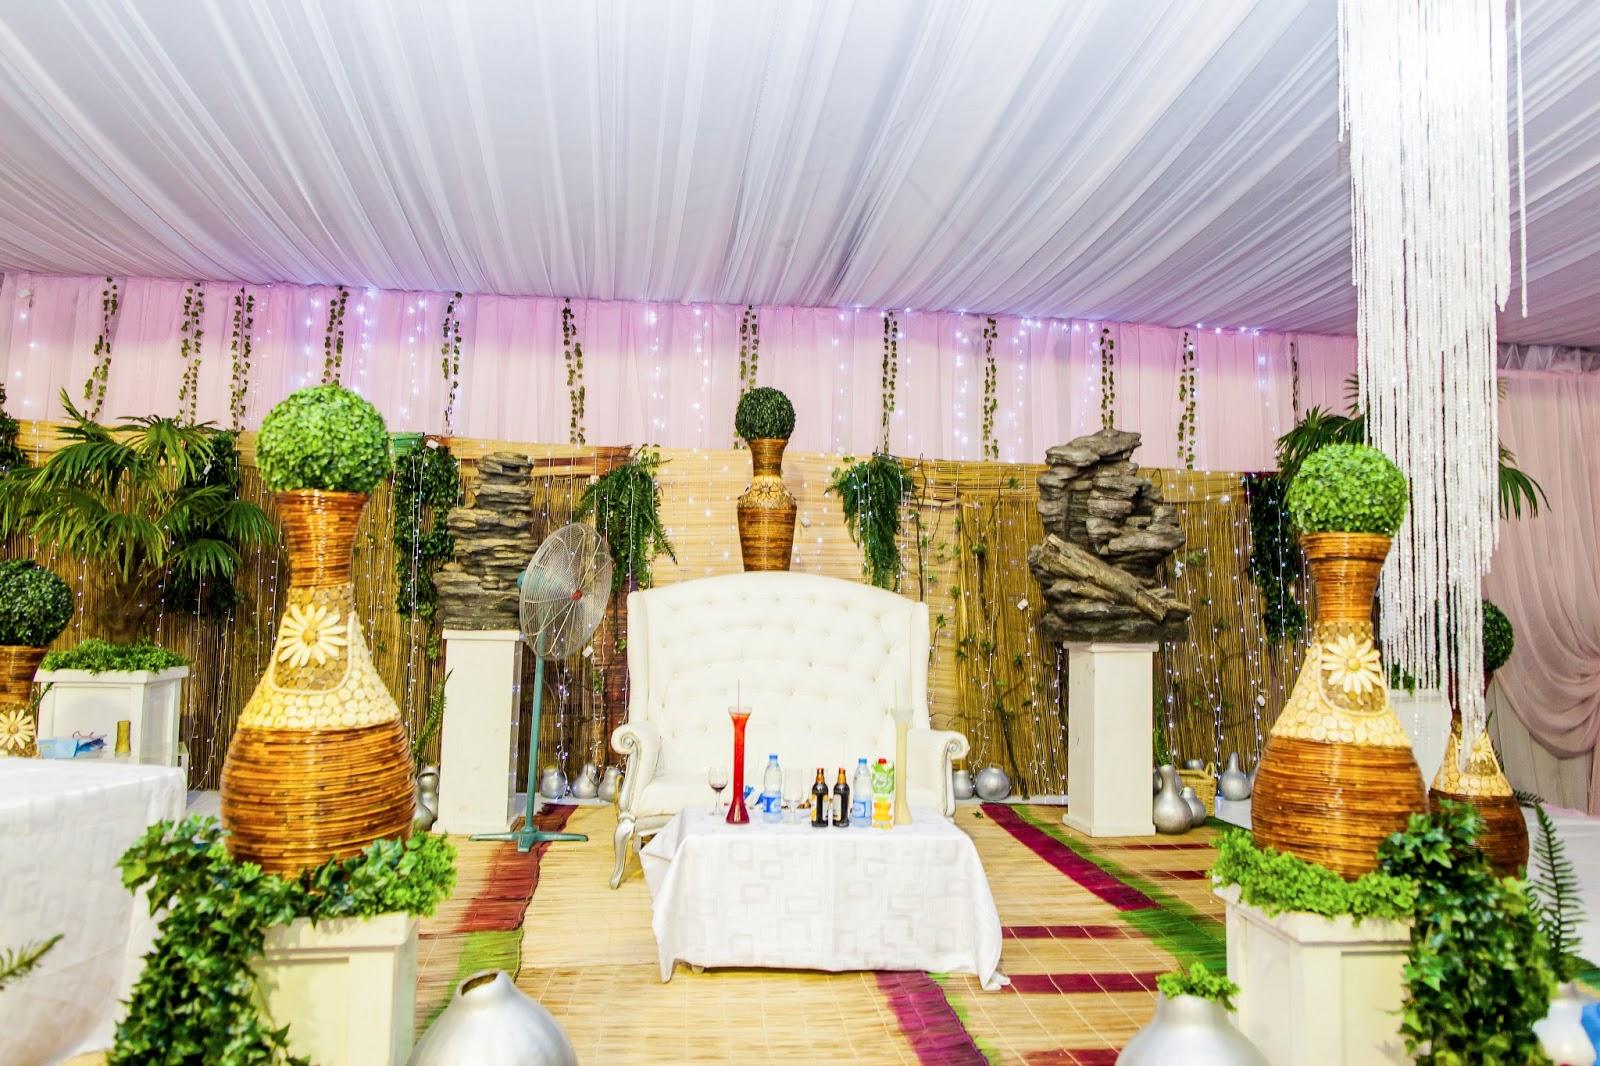 traditional wedding decor romantic decoration. Black Bedroom Furniture Sets. Home Design Ideas